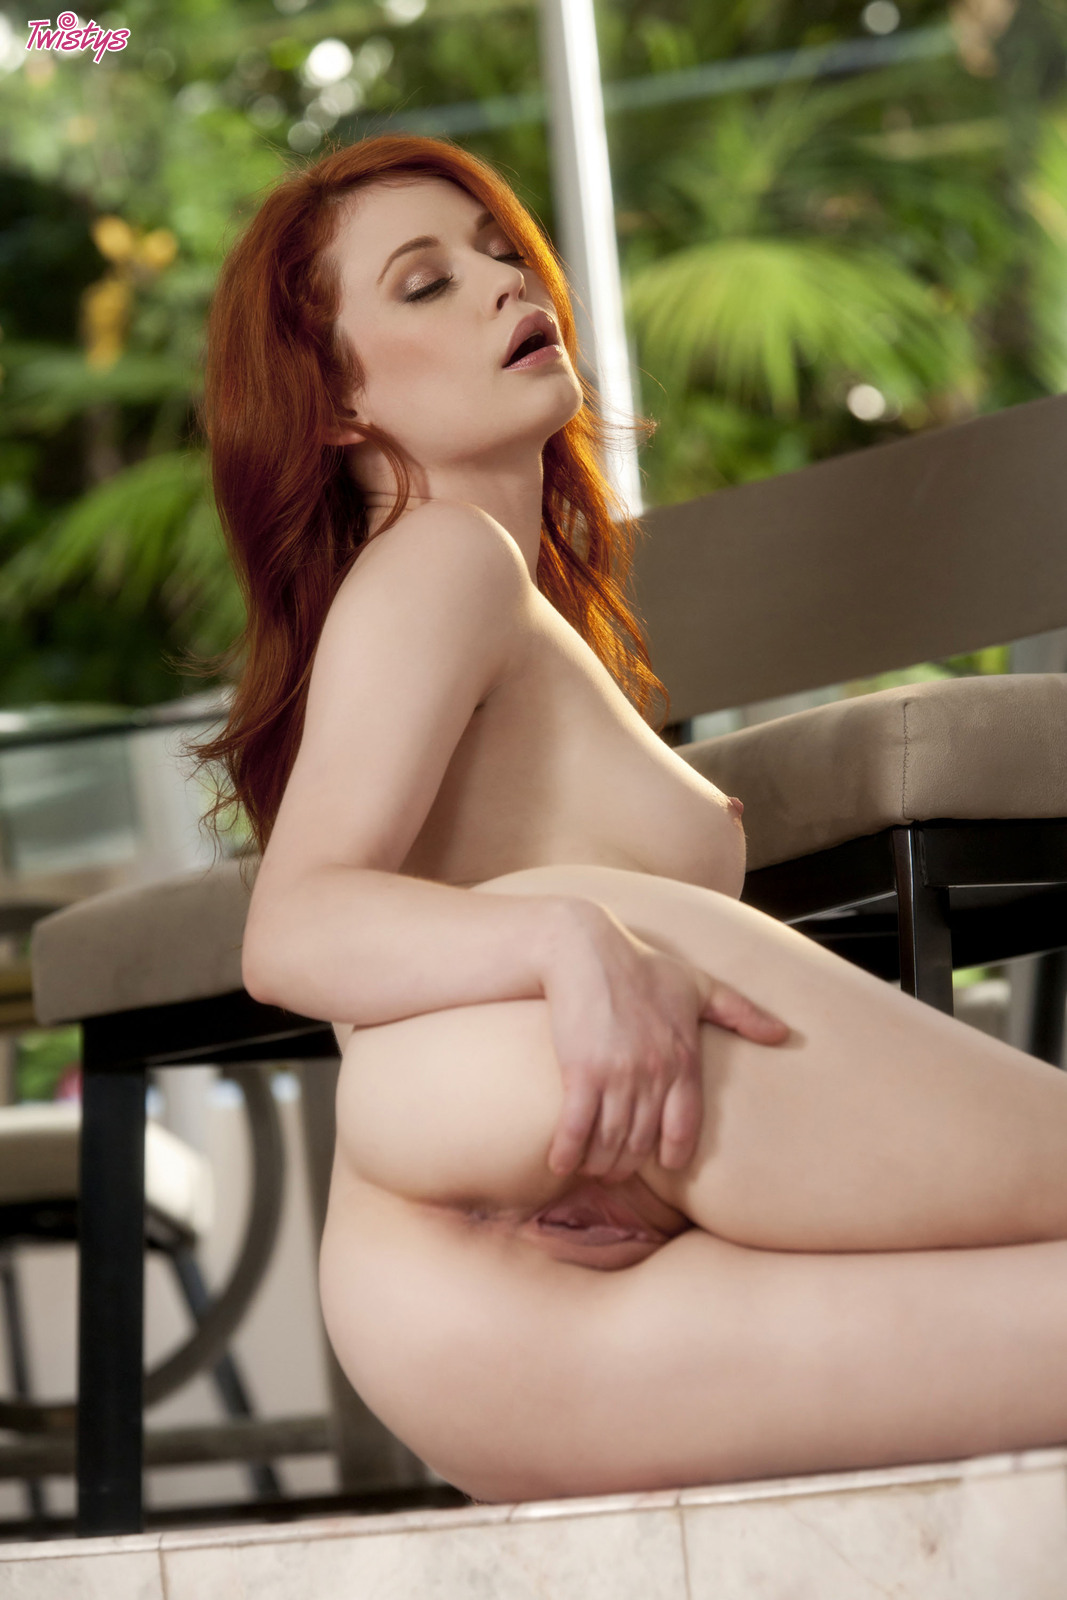 4206973_138627797132_baldcunt_erotiqlinks_greatass_JustineJoli_redhead_sexy.jpg